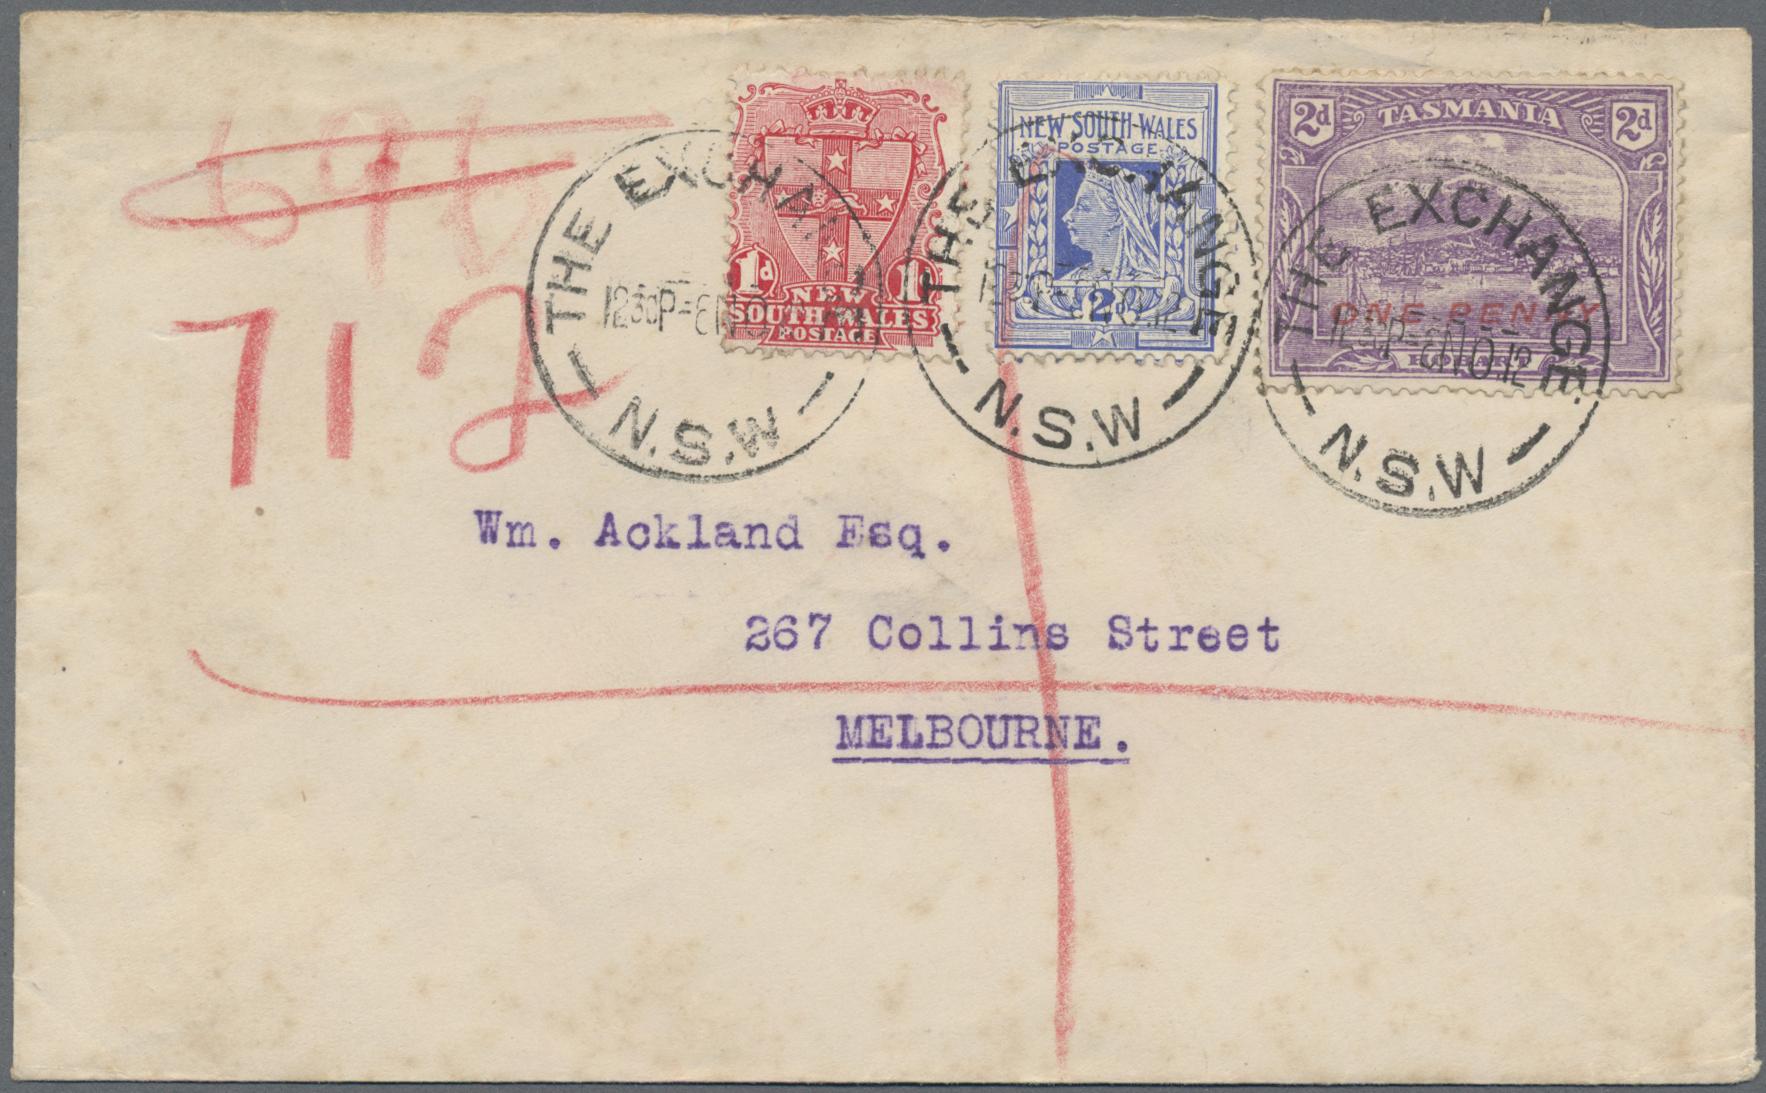 Lot 16062 - Australische Staaten   Australian States  -  Auktionshaus Christoph Gärtner GmbH & Co. KG 50th Auction Anniversary Auction - Day 5